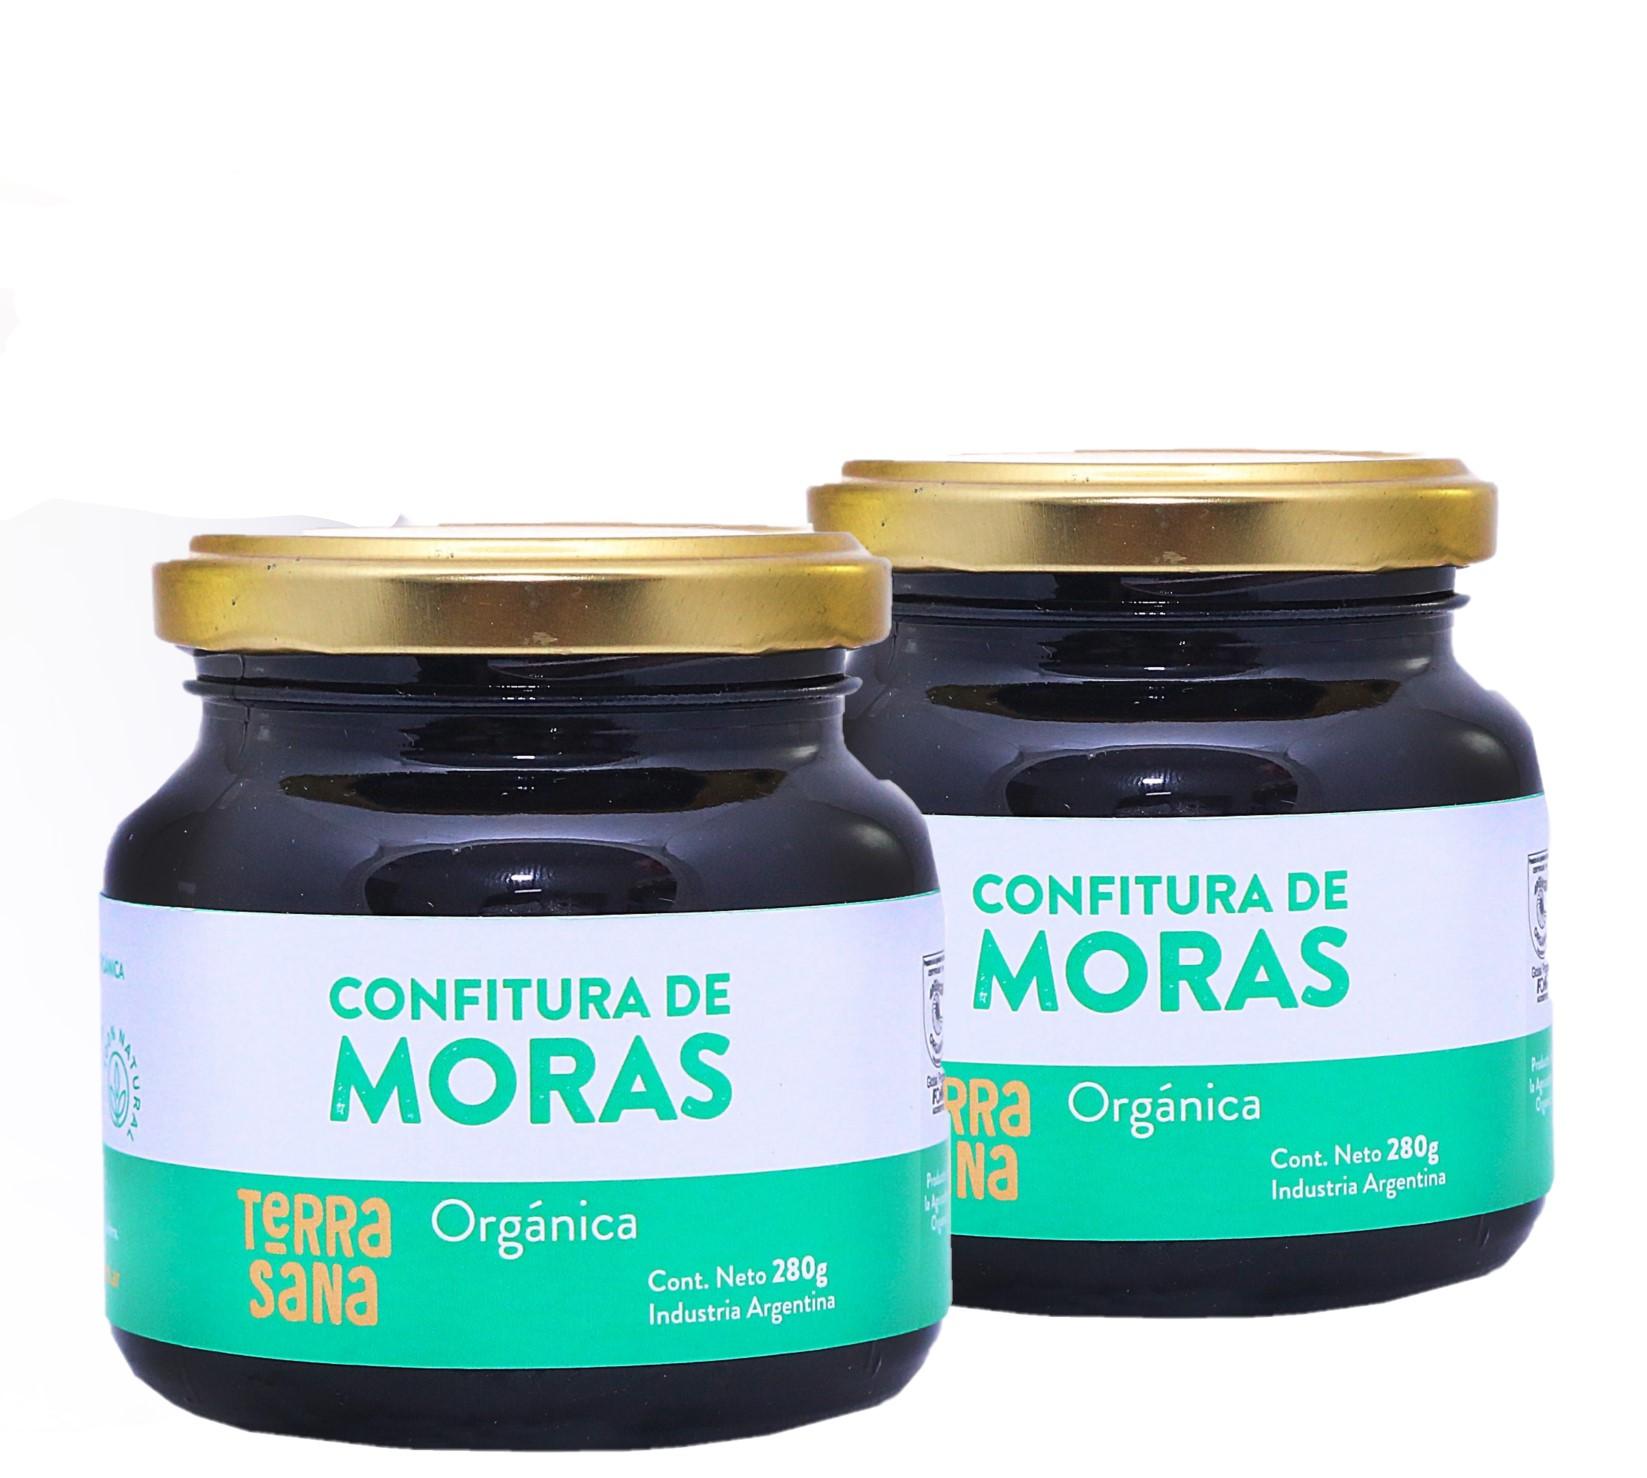 BLACK FRIDAY 2X1 mermelada moras